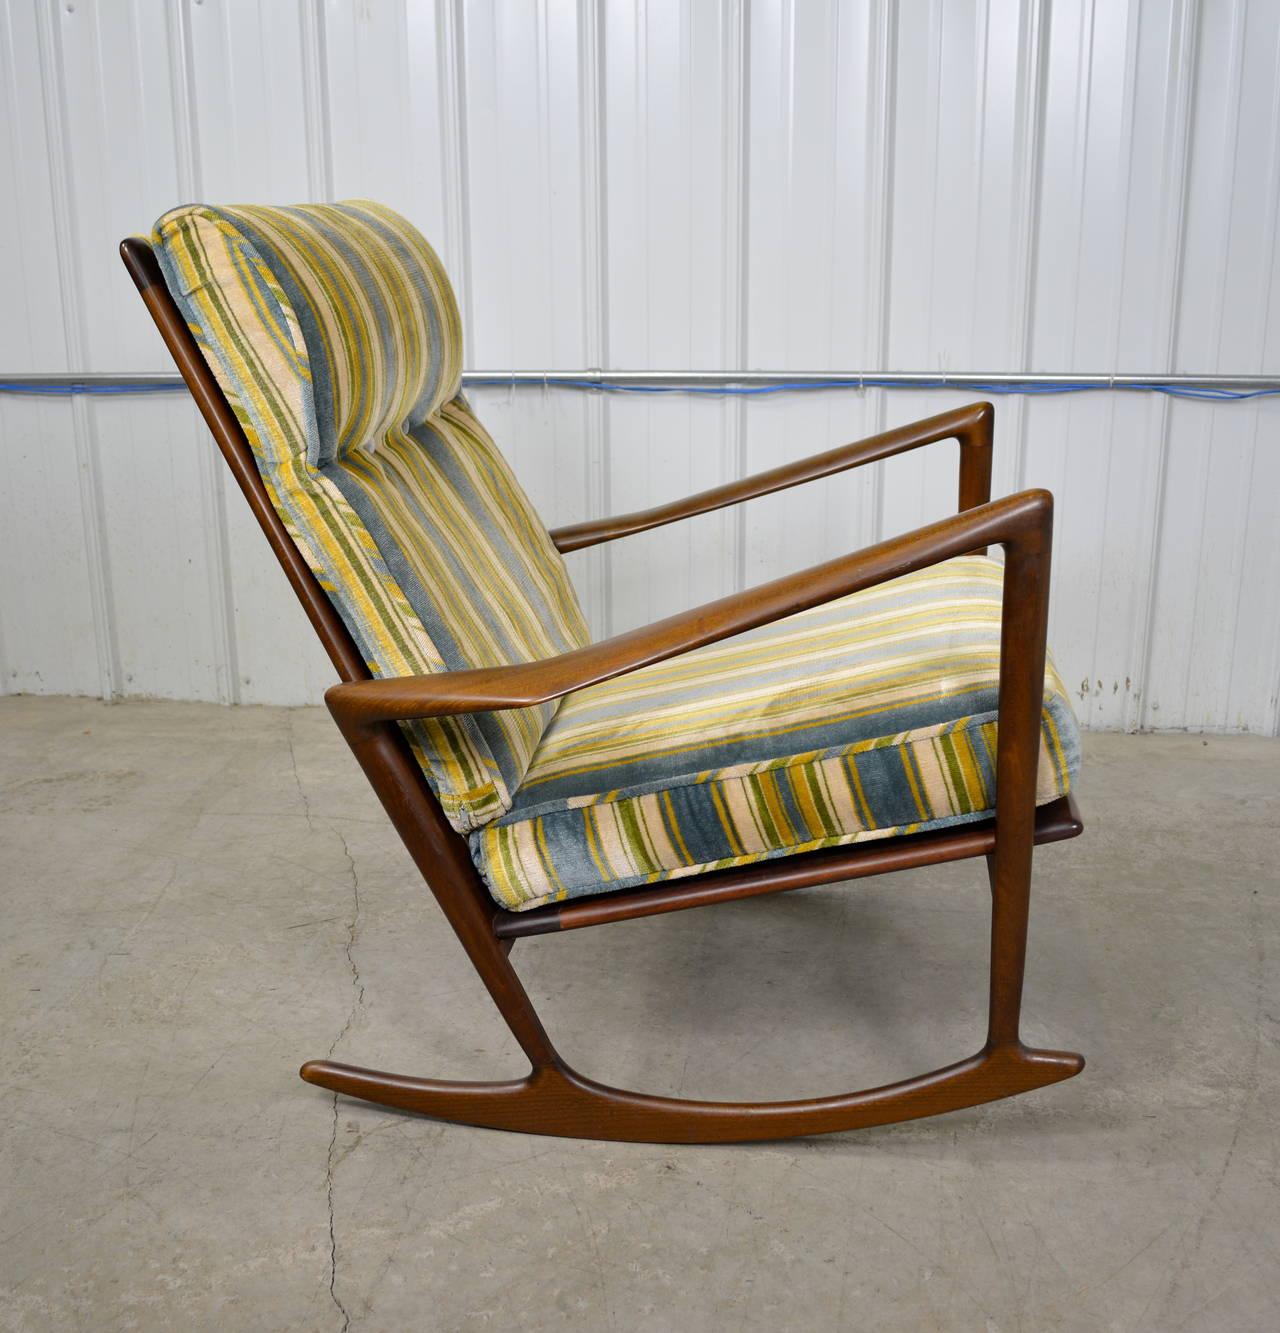 danish modern rocking chair quiet swivel ib kofod larsen at 1stdibs